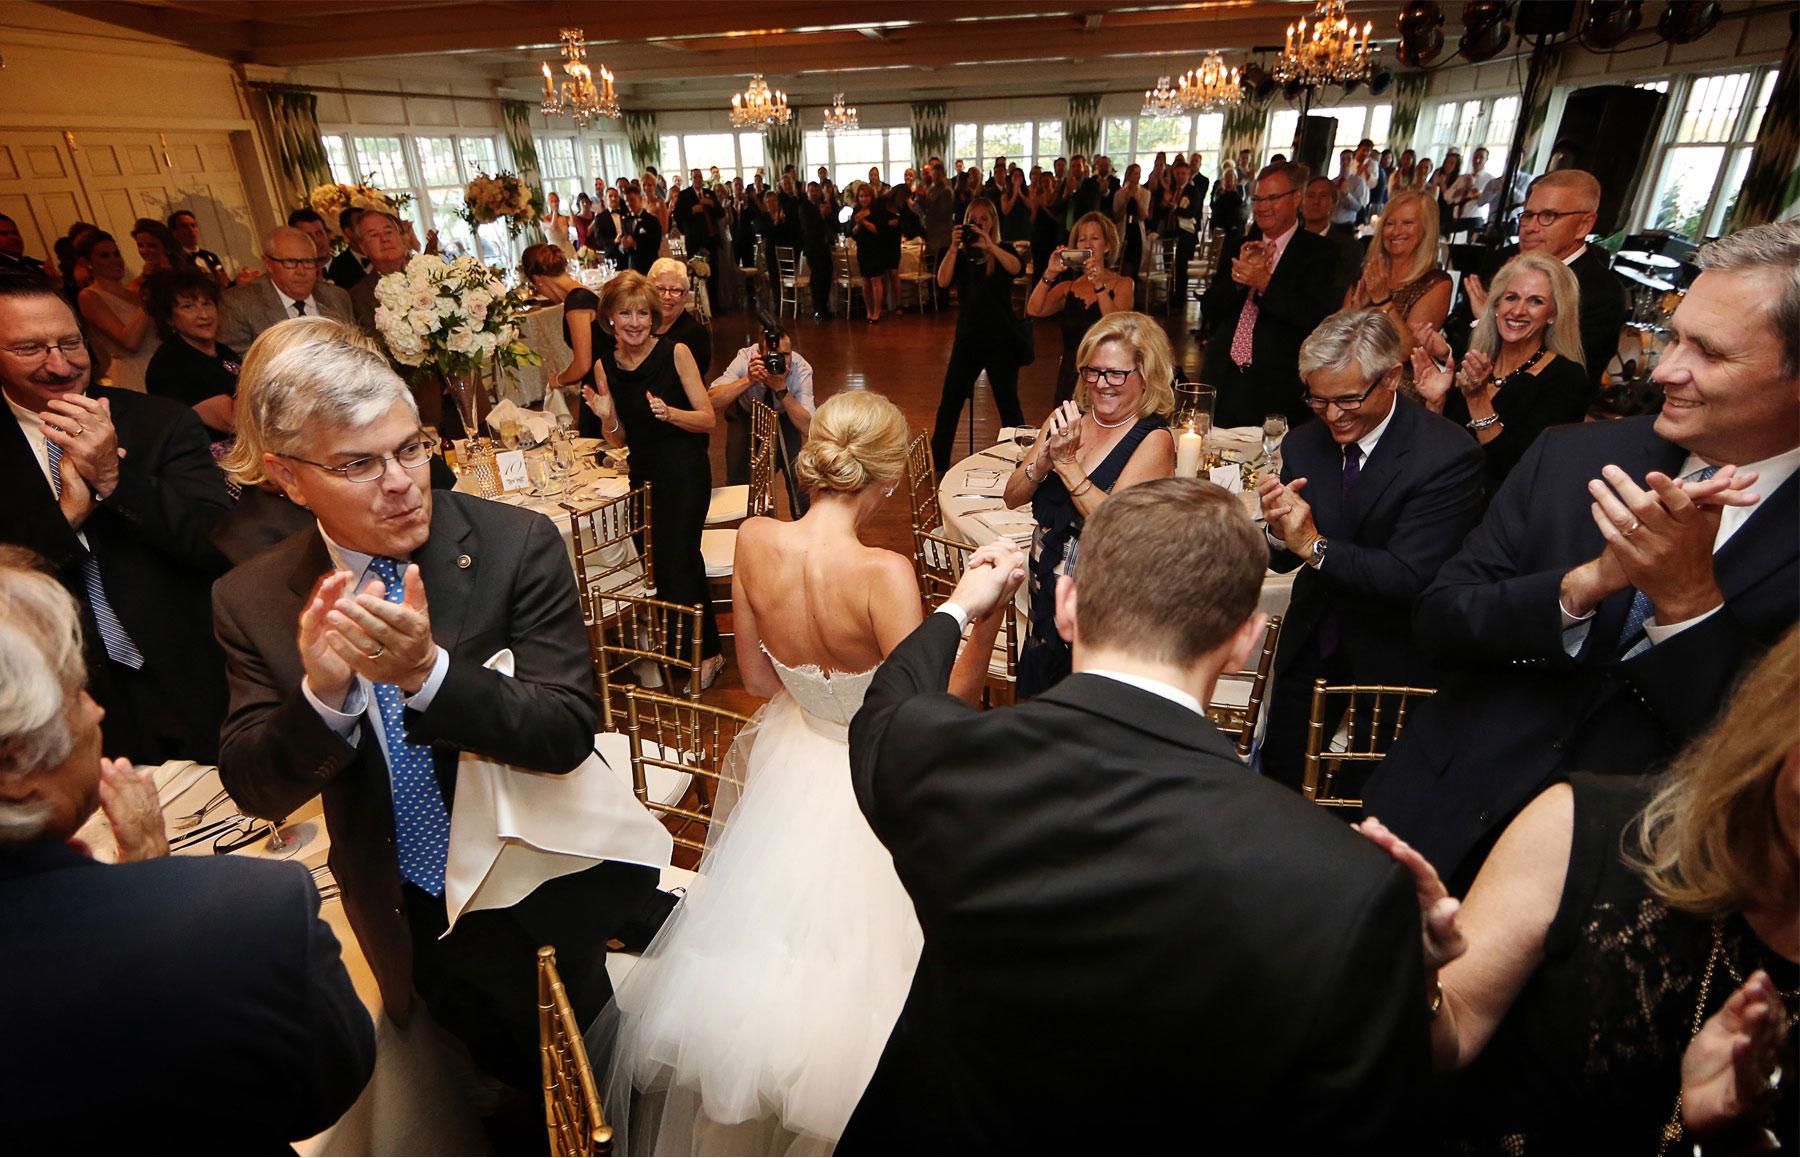 24-Minneapolis-Minnesota-Wedding-Photography-by-Vick-Photography-Minikahda-Country-Club-Reception-Sarah-&-Brett.jpg